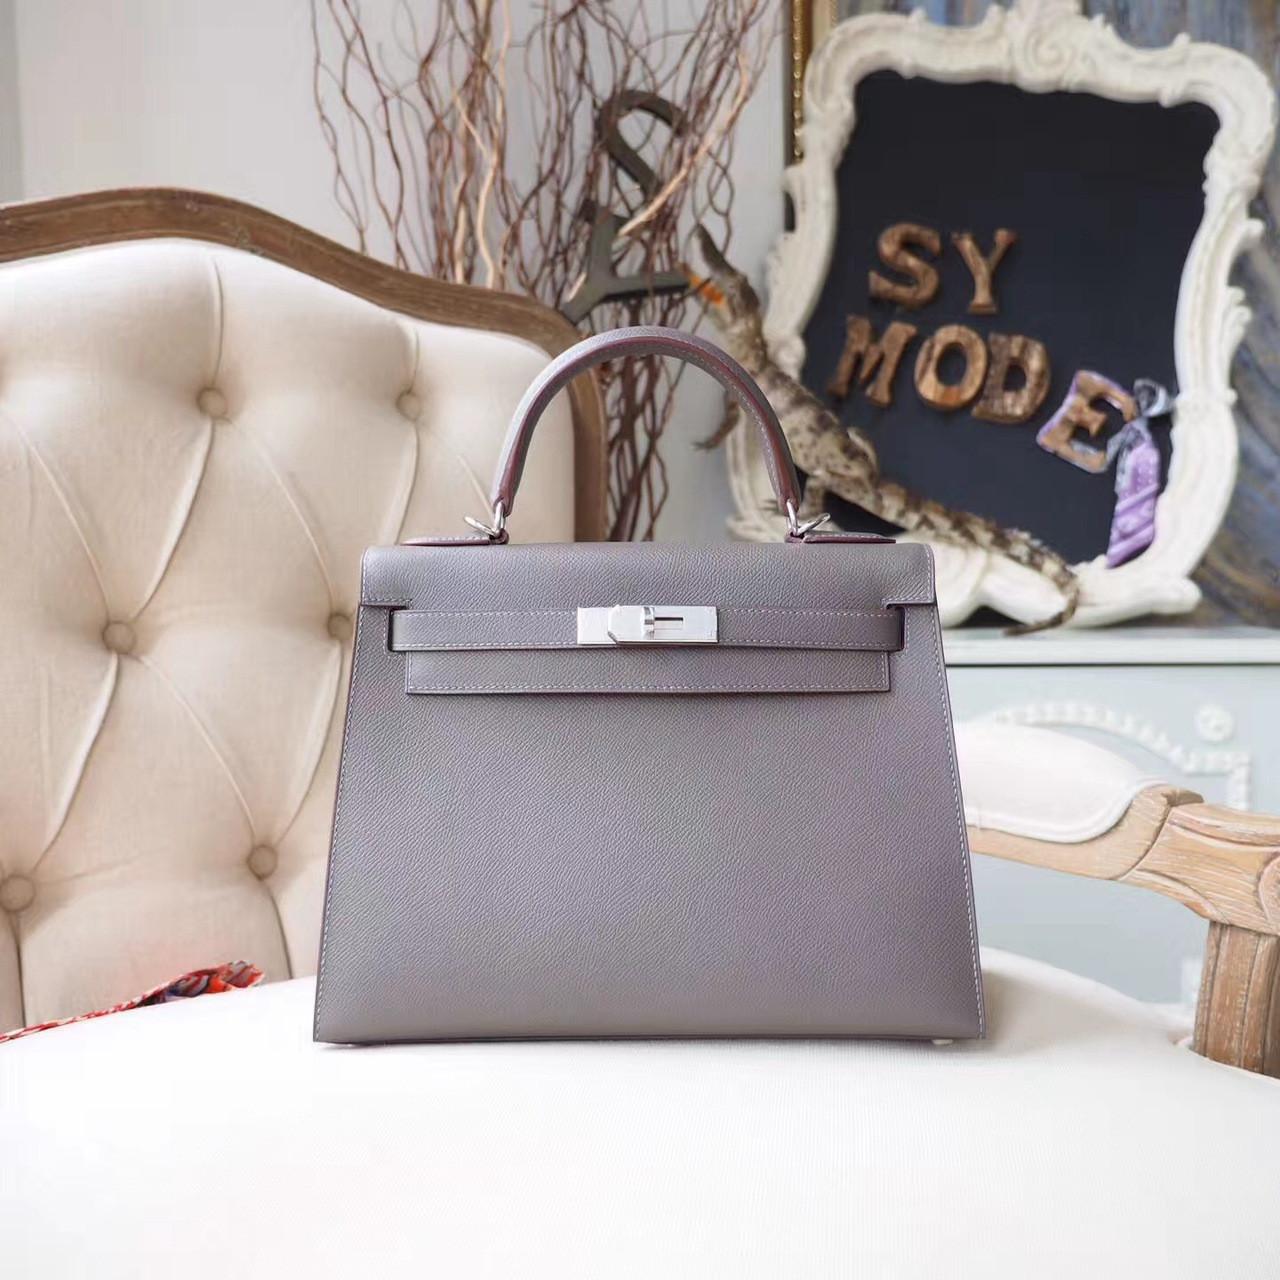 0a042be3db73 Hermes Kelly 28cm Bag Epsom Calfskin Leather Palladium Hardware ...